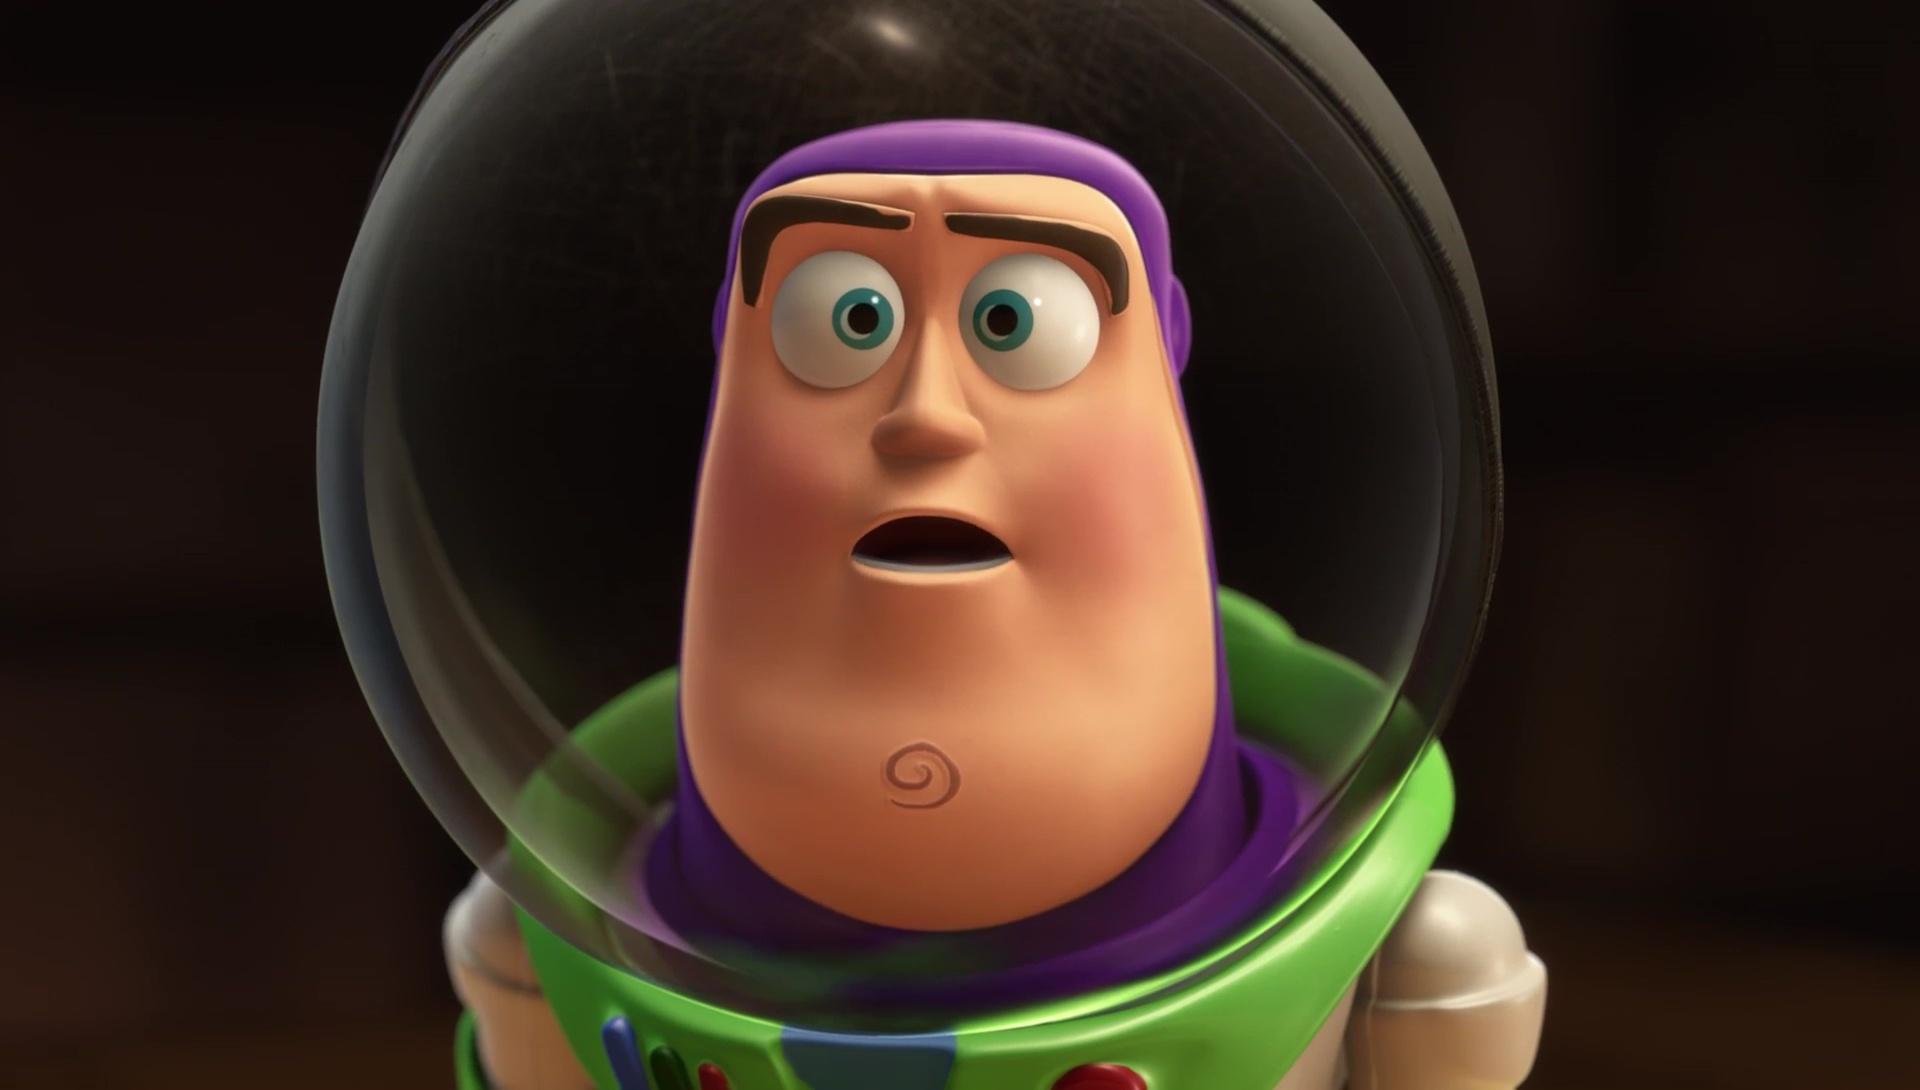 mini-buzz-personnage-toy-story-mini-buzz-04